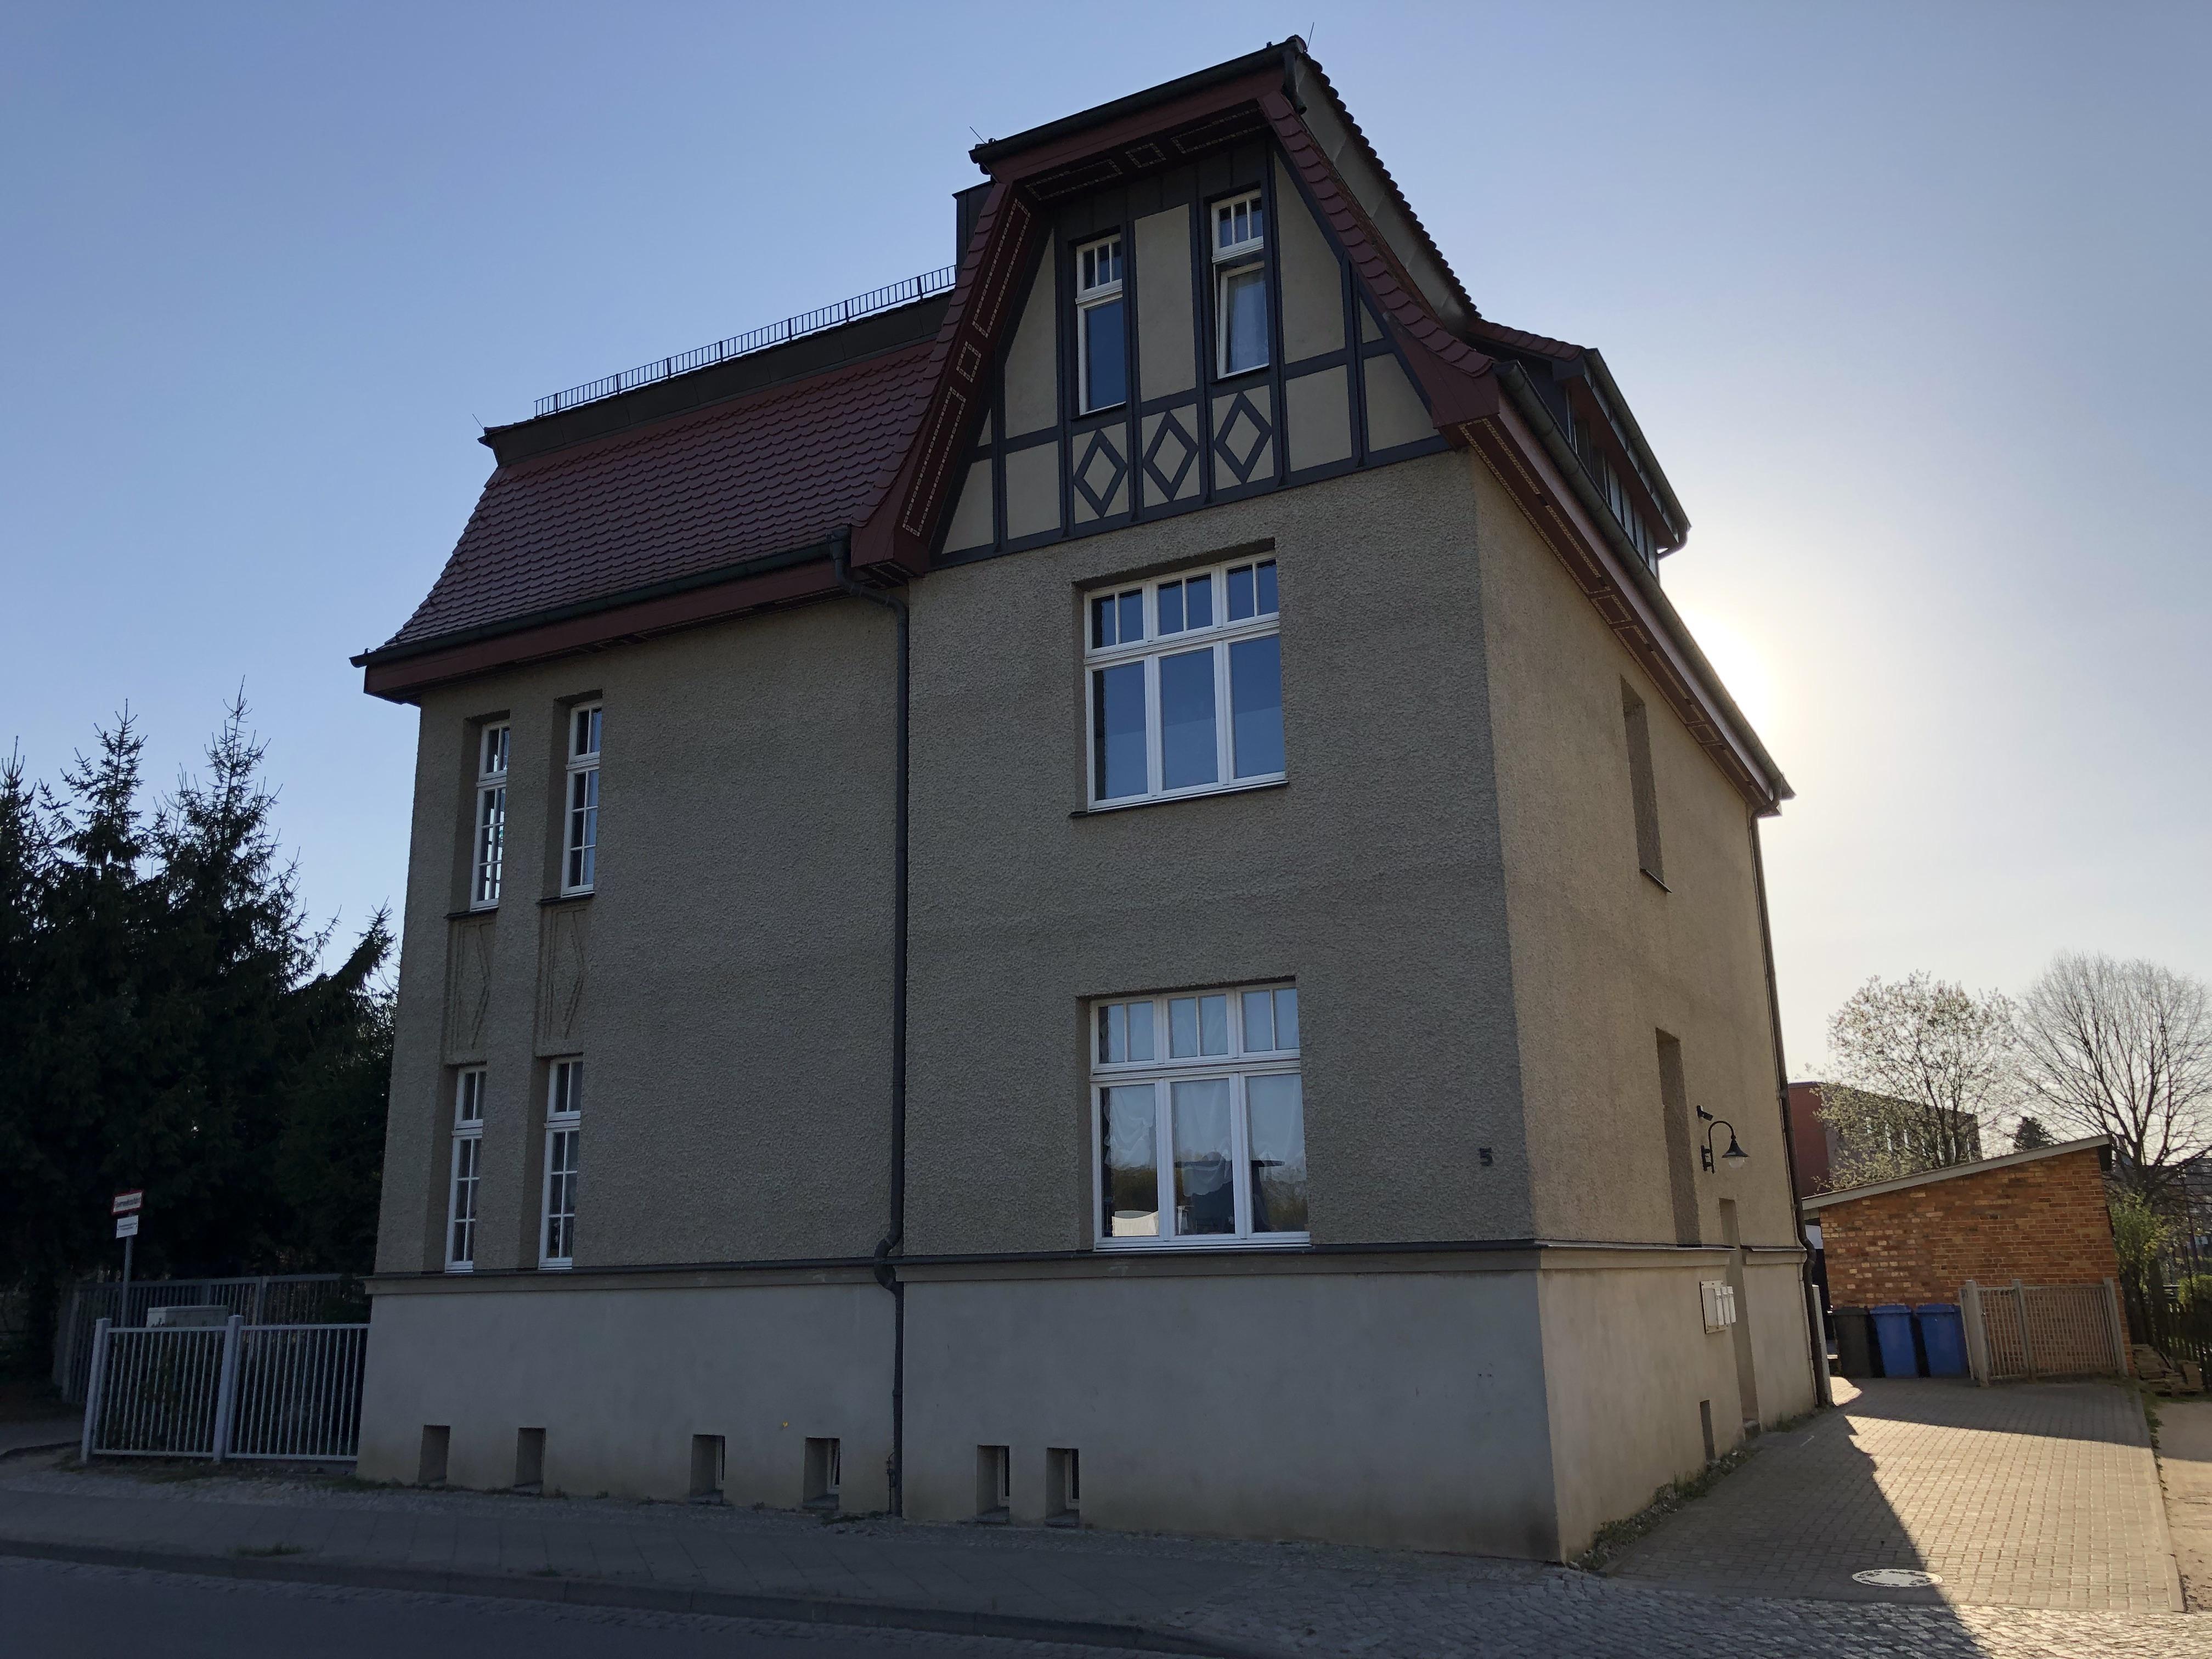 Carl-Meier-Straße 5